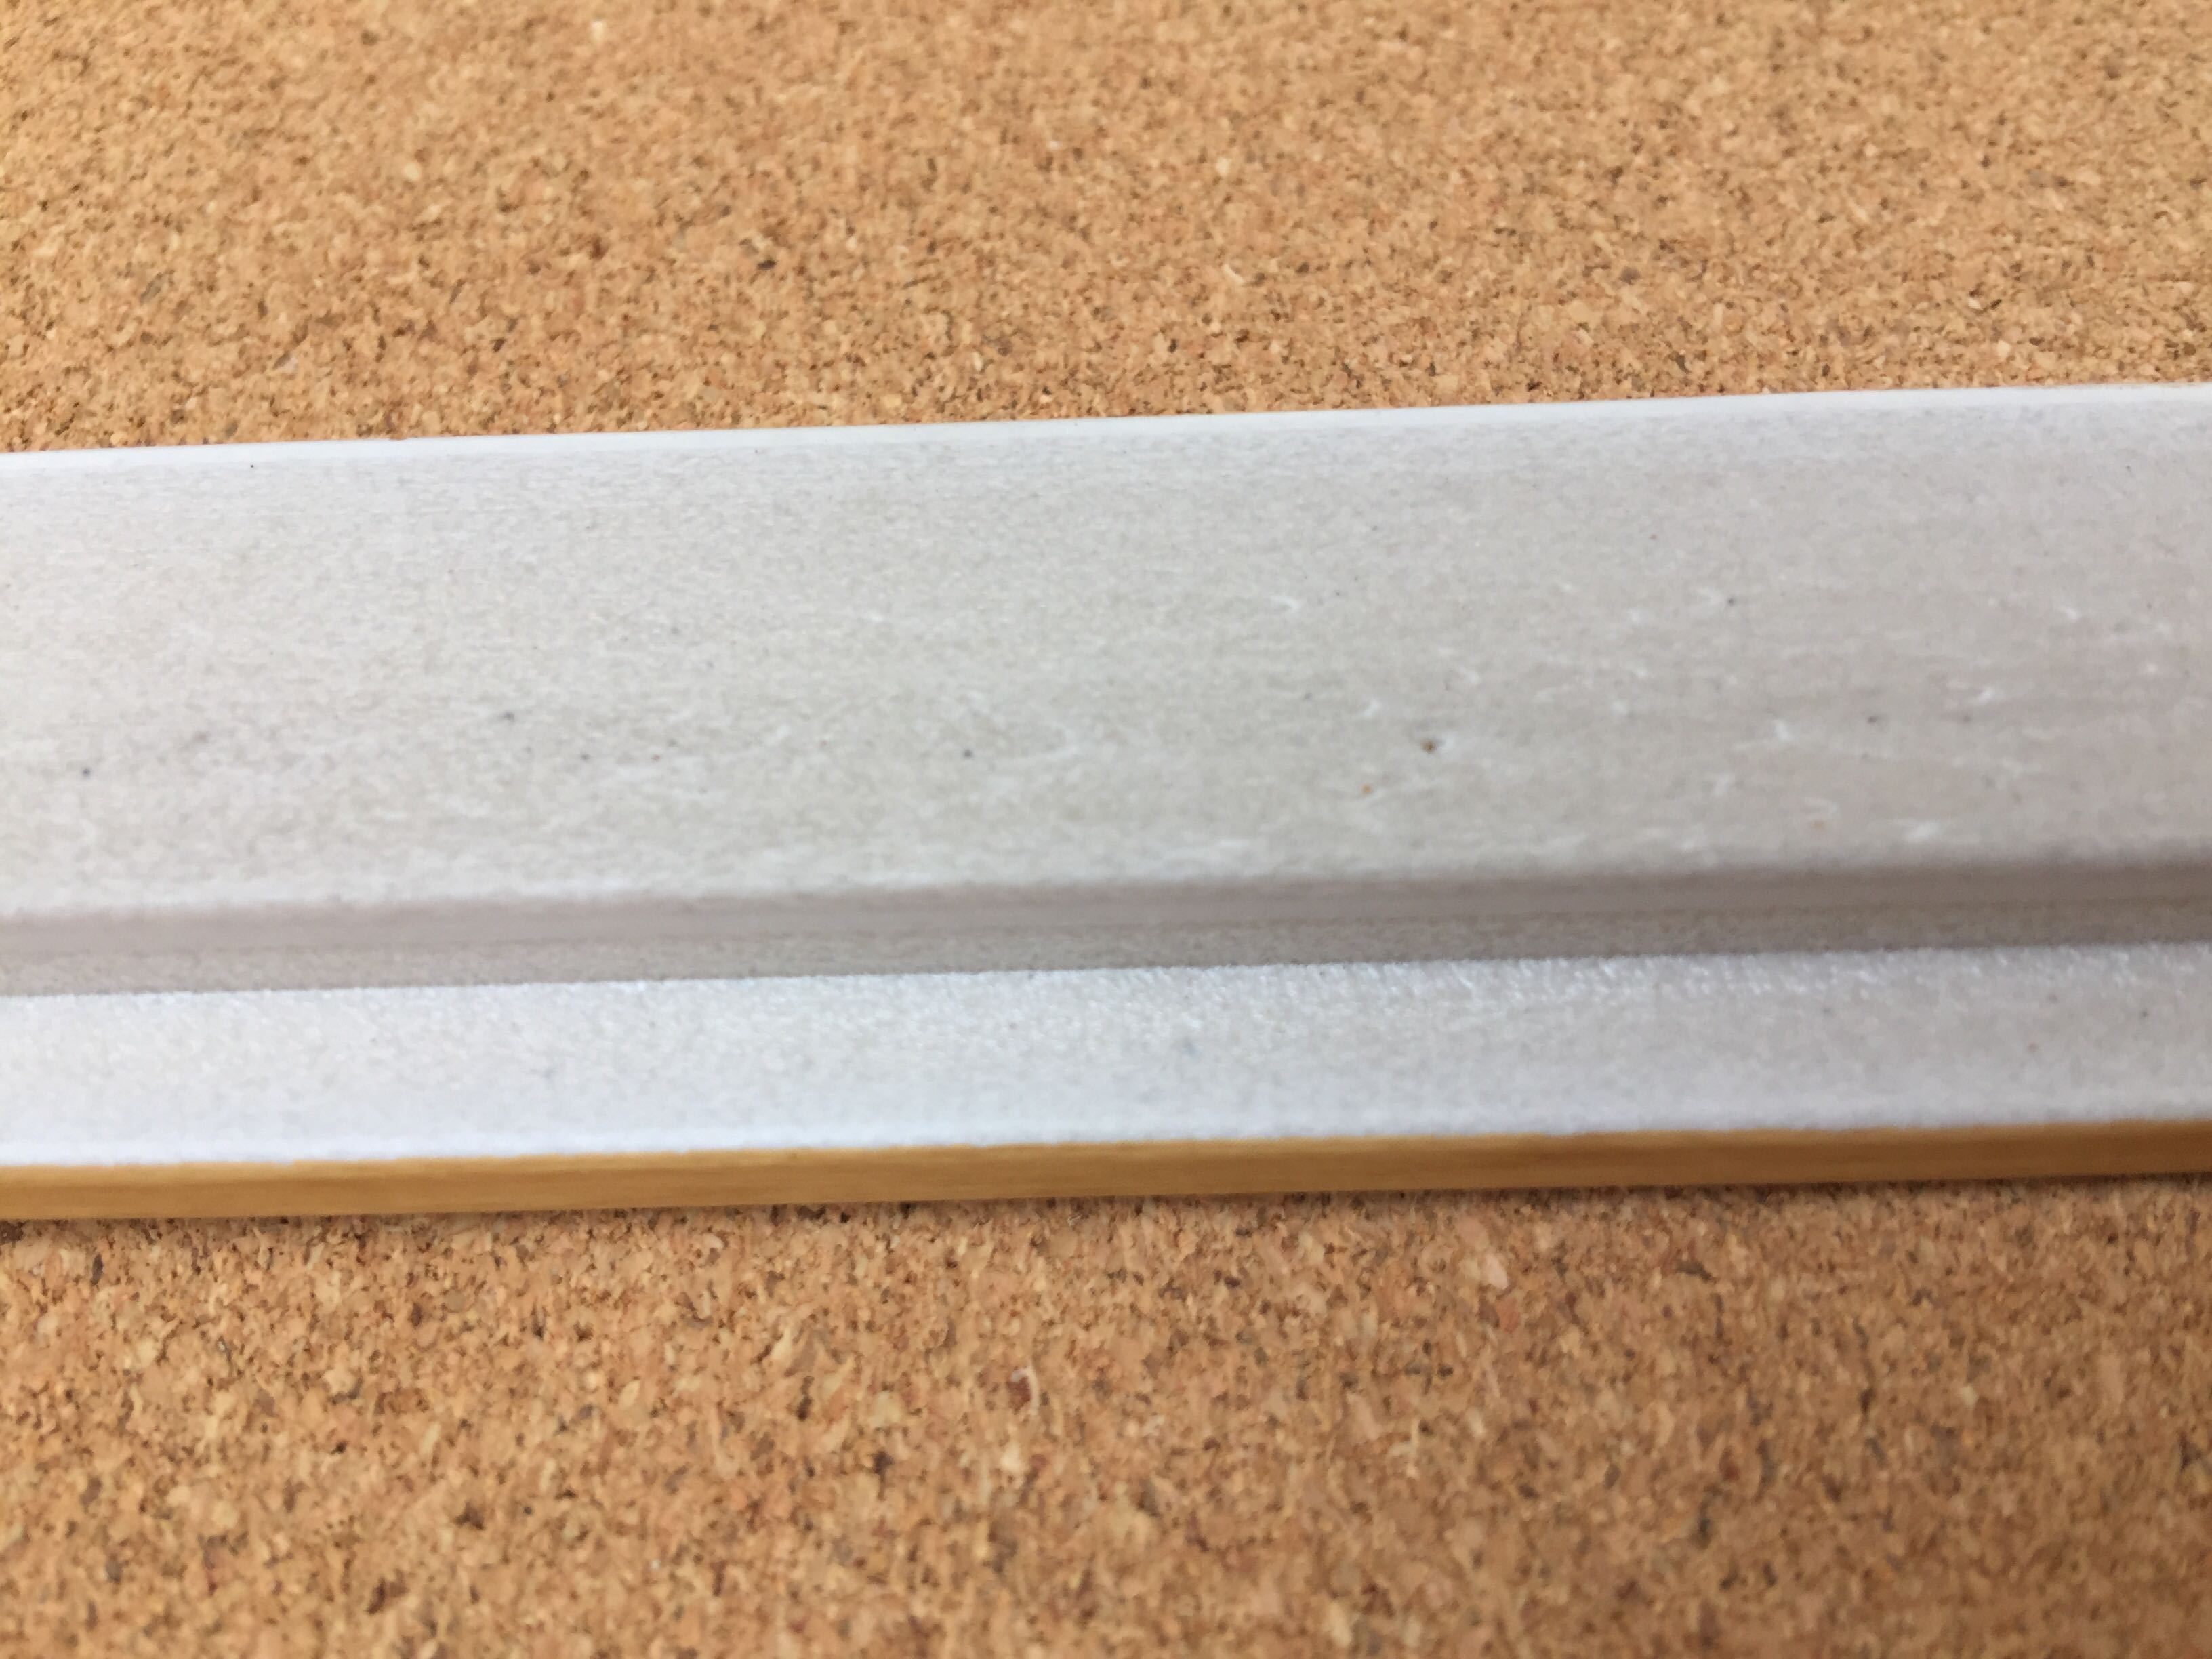 8MM软木板专用边框软木告示栏软木留言板软木专用边框七彩虹边框